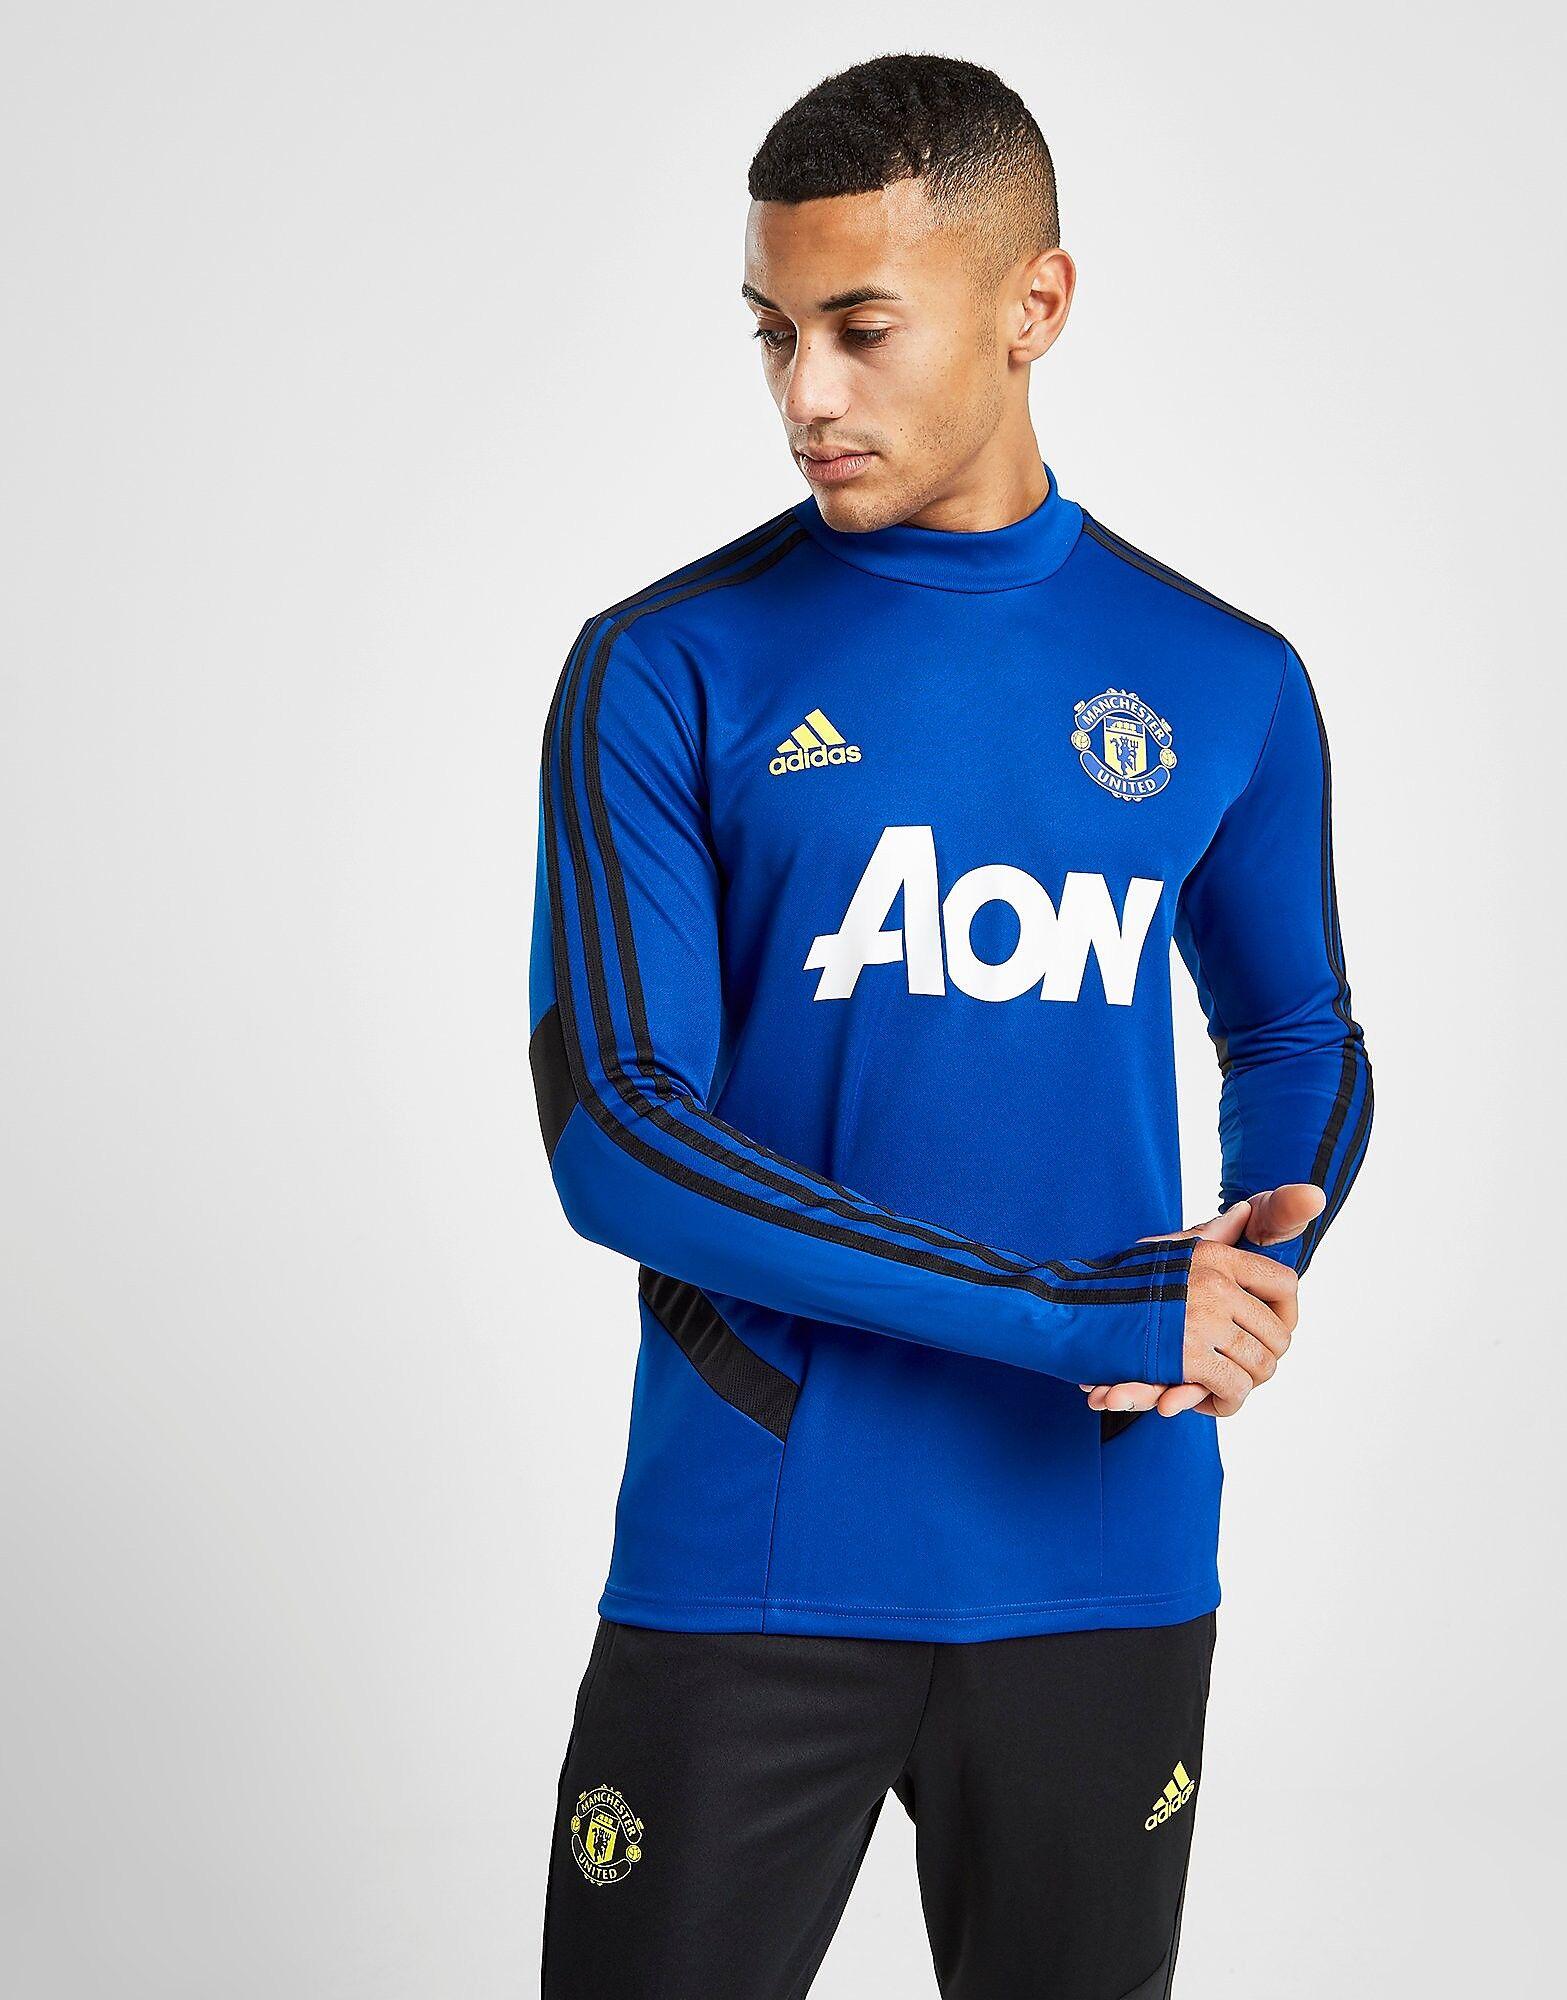 Image of Adidas Manchester United FC Treenipaita - Mens, Sininen